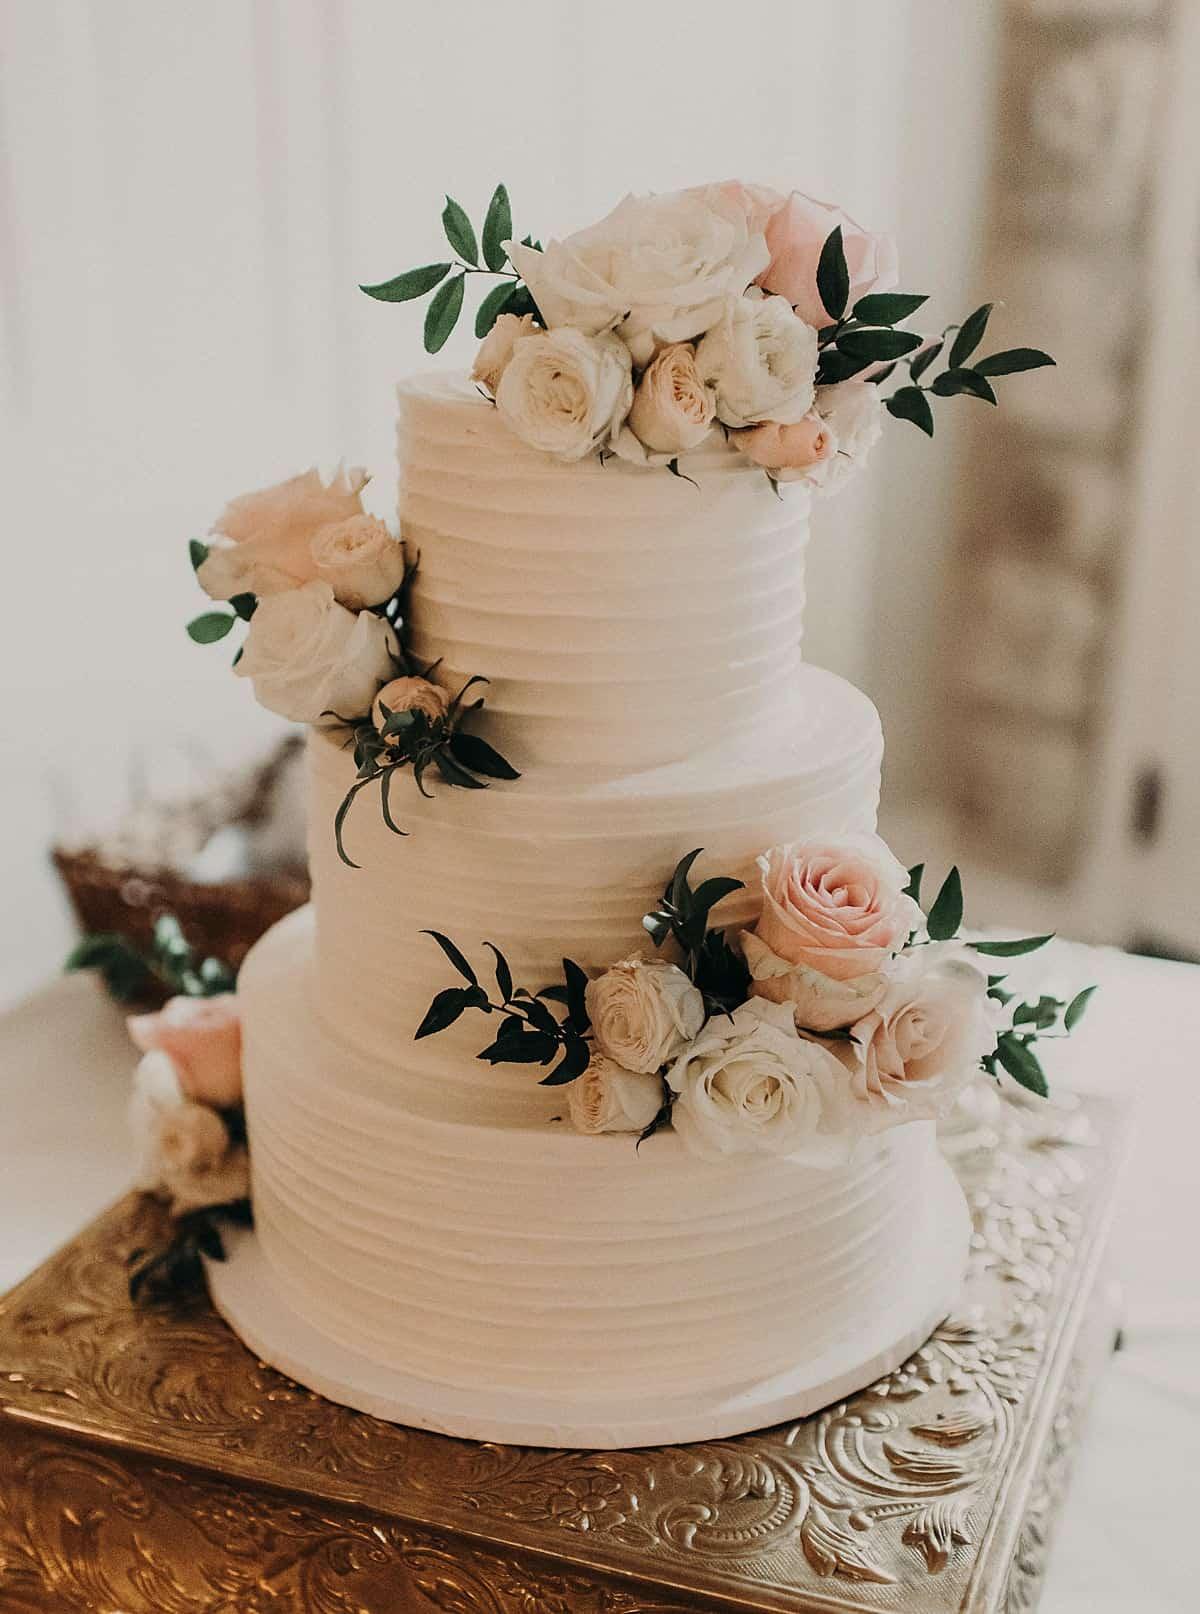 Austin Texas Wedding - Wonderful Celebration at Chateau Bellevue